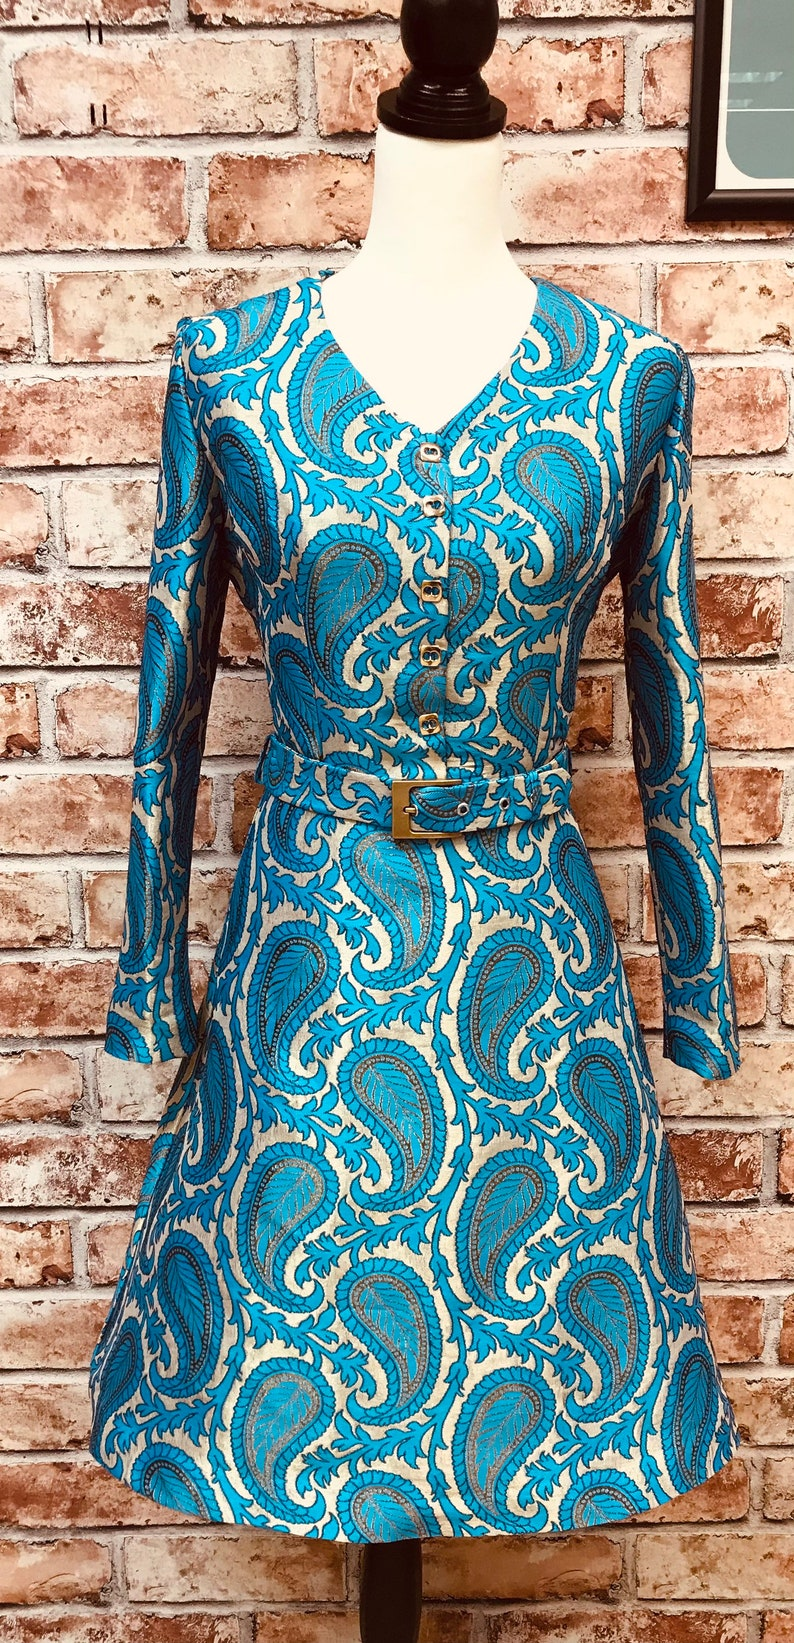 60s Dresses   1960s Dresses Mod, Mini, Hippie Paisley Mod Dress 1960s inspired long sleeve belted $123.58 AT vintagedancer.com